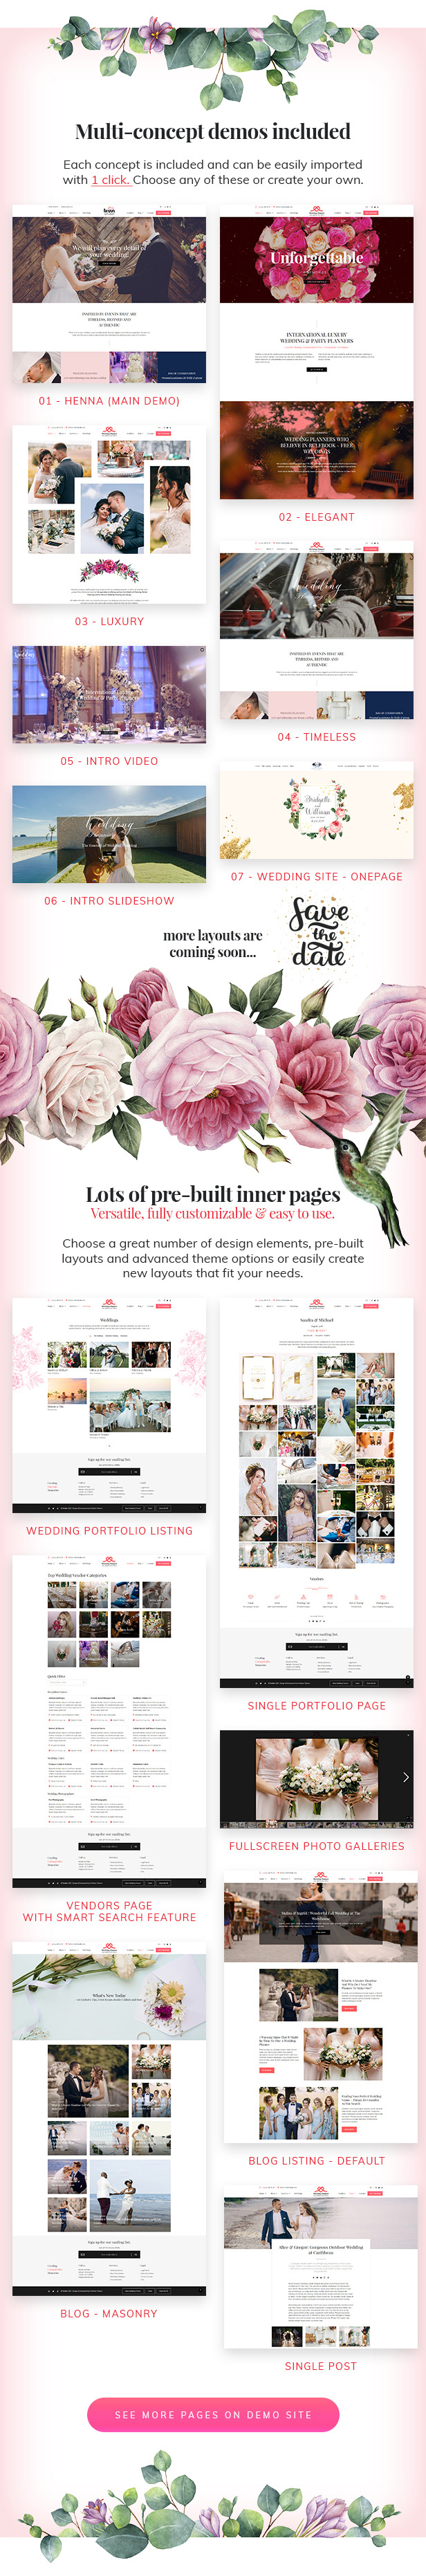 Henna - Wedding WordPress Theme - 3